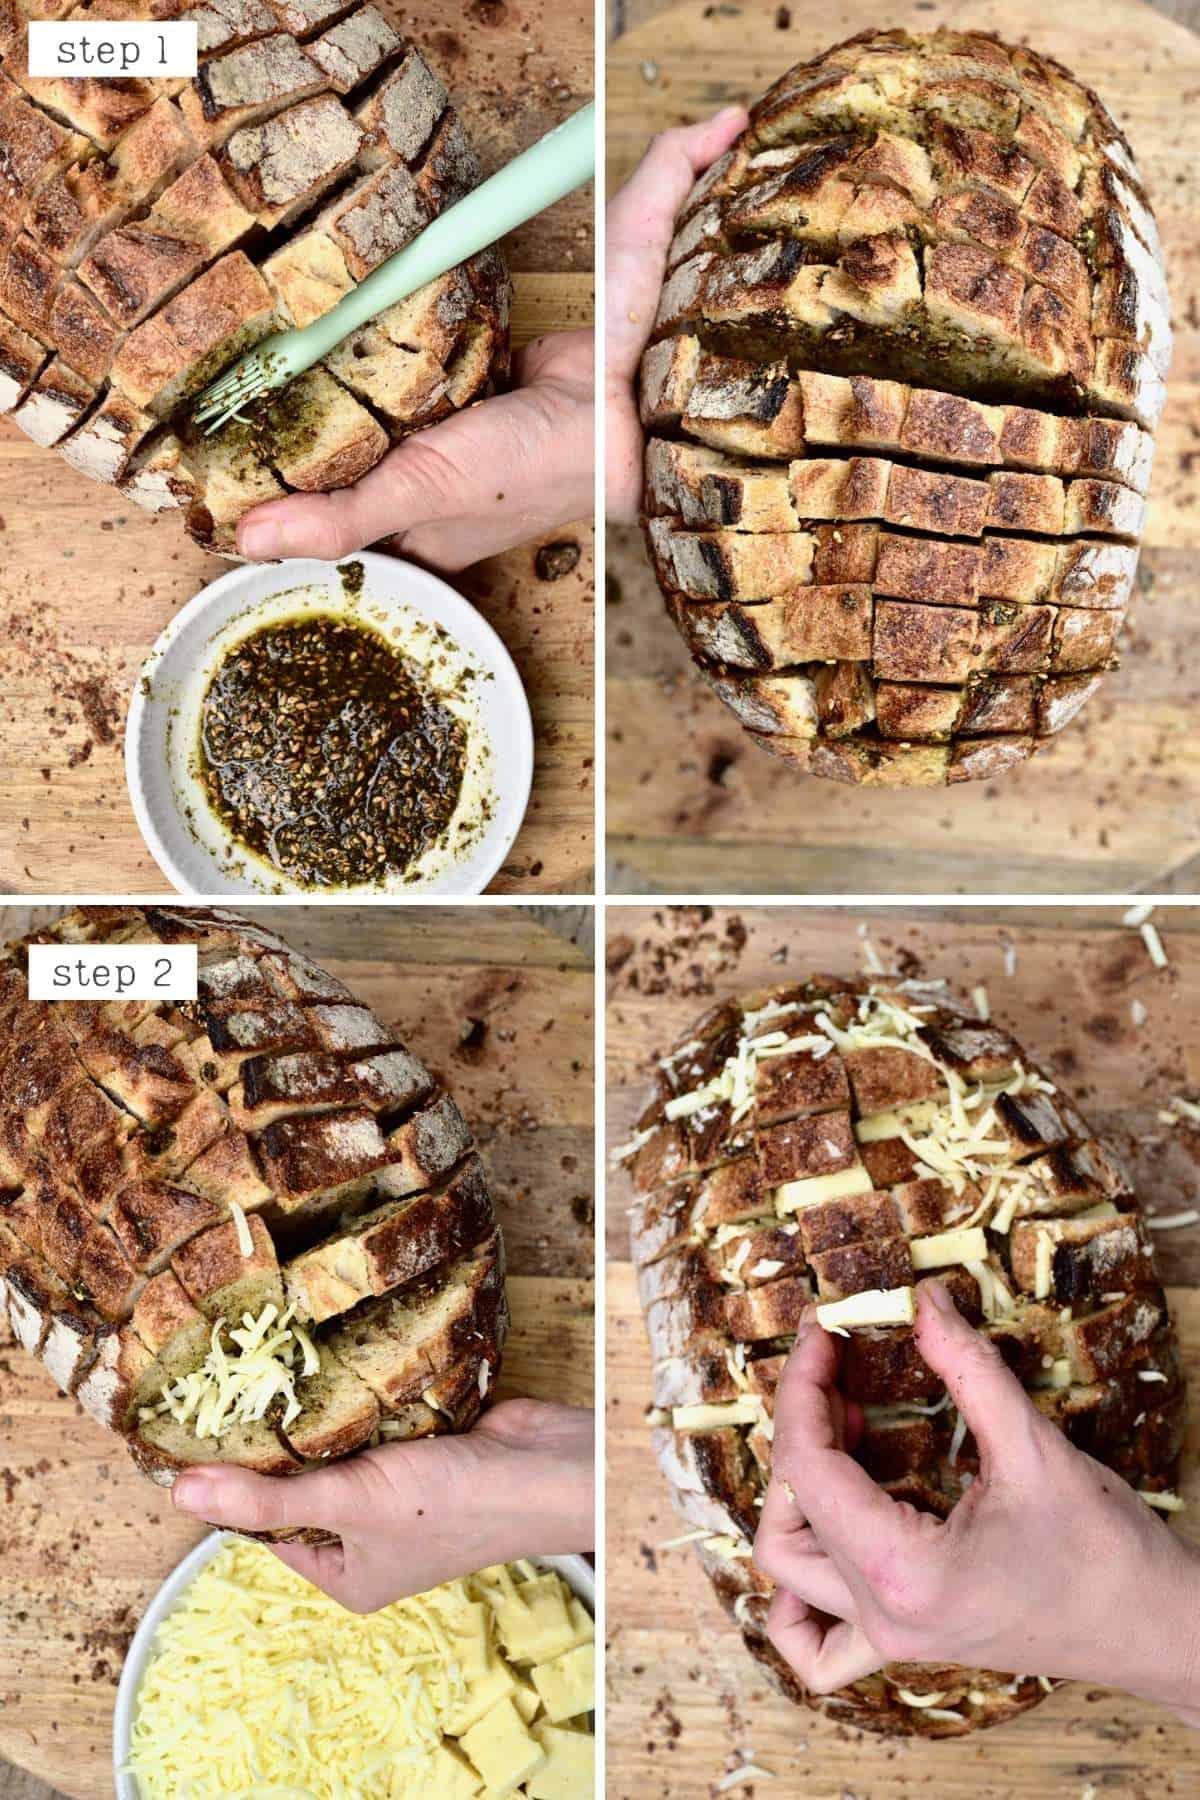 Steps for filling pull-apart bread